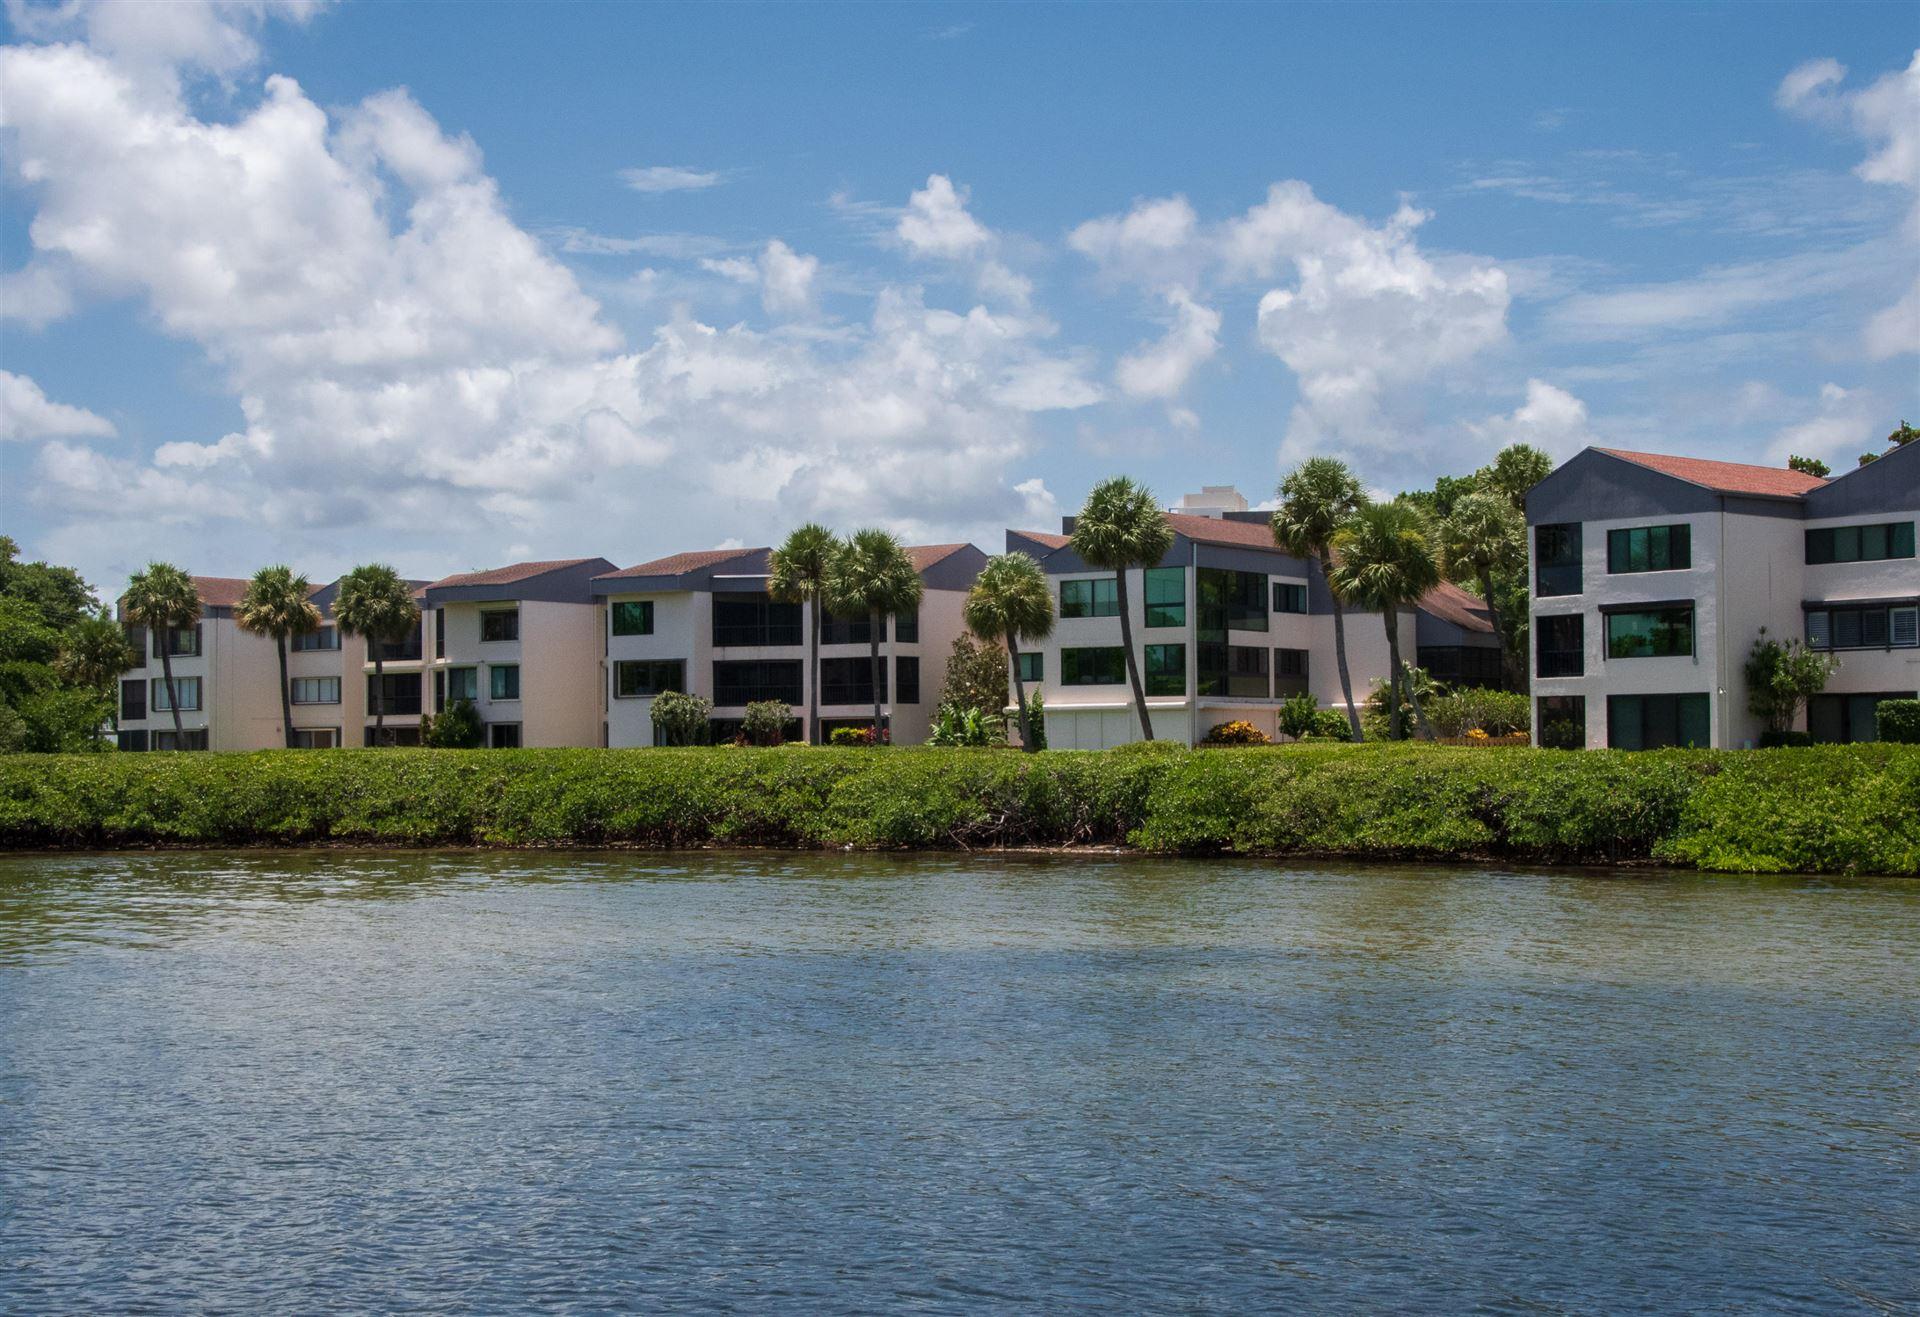 1660 Twelve Oaks Way #202, North Palm Beach, FL 33408 - #: RX-10643152